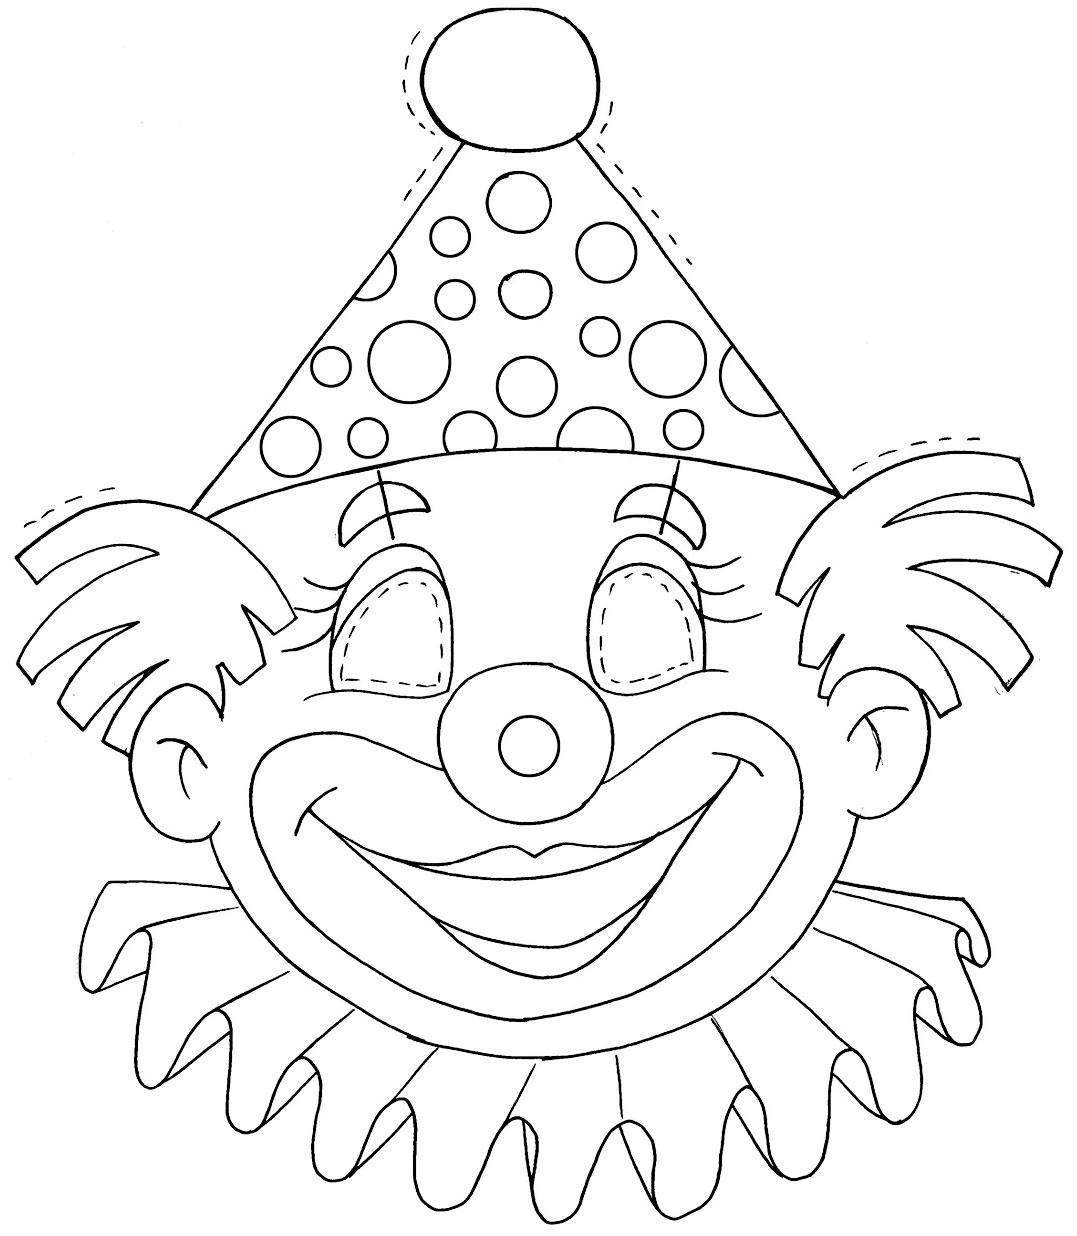 Molde Mascara Palhaco Carnaval